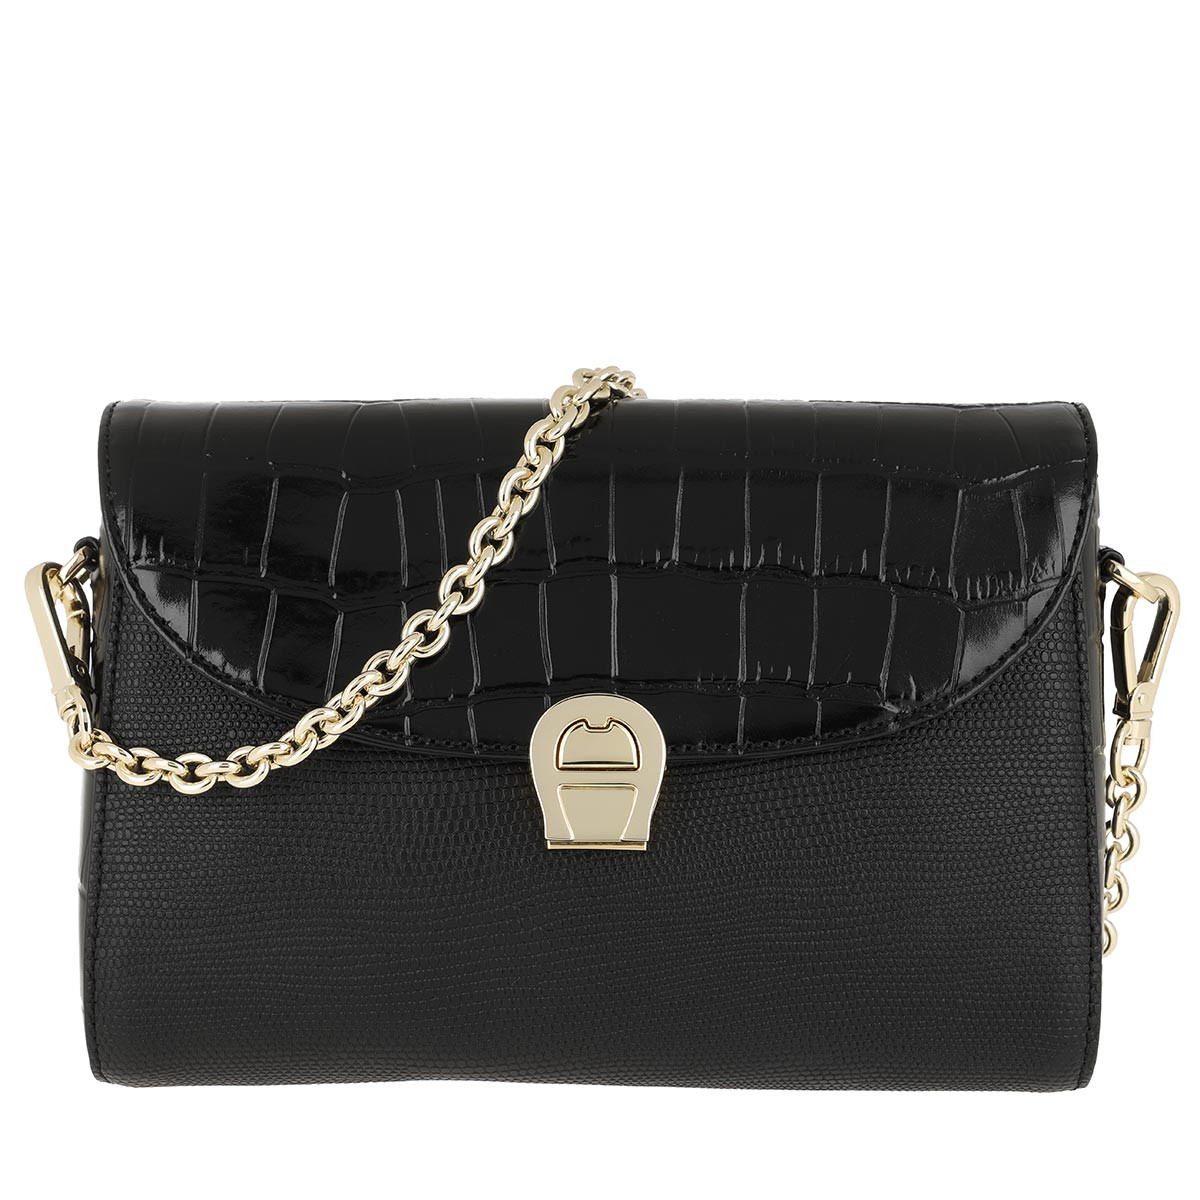 Aigner Umhängetasche - Crossbody Bag Genoveva Croco Black - in schwarz - für Damen